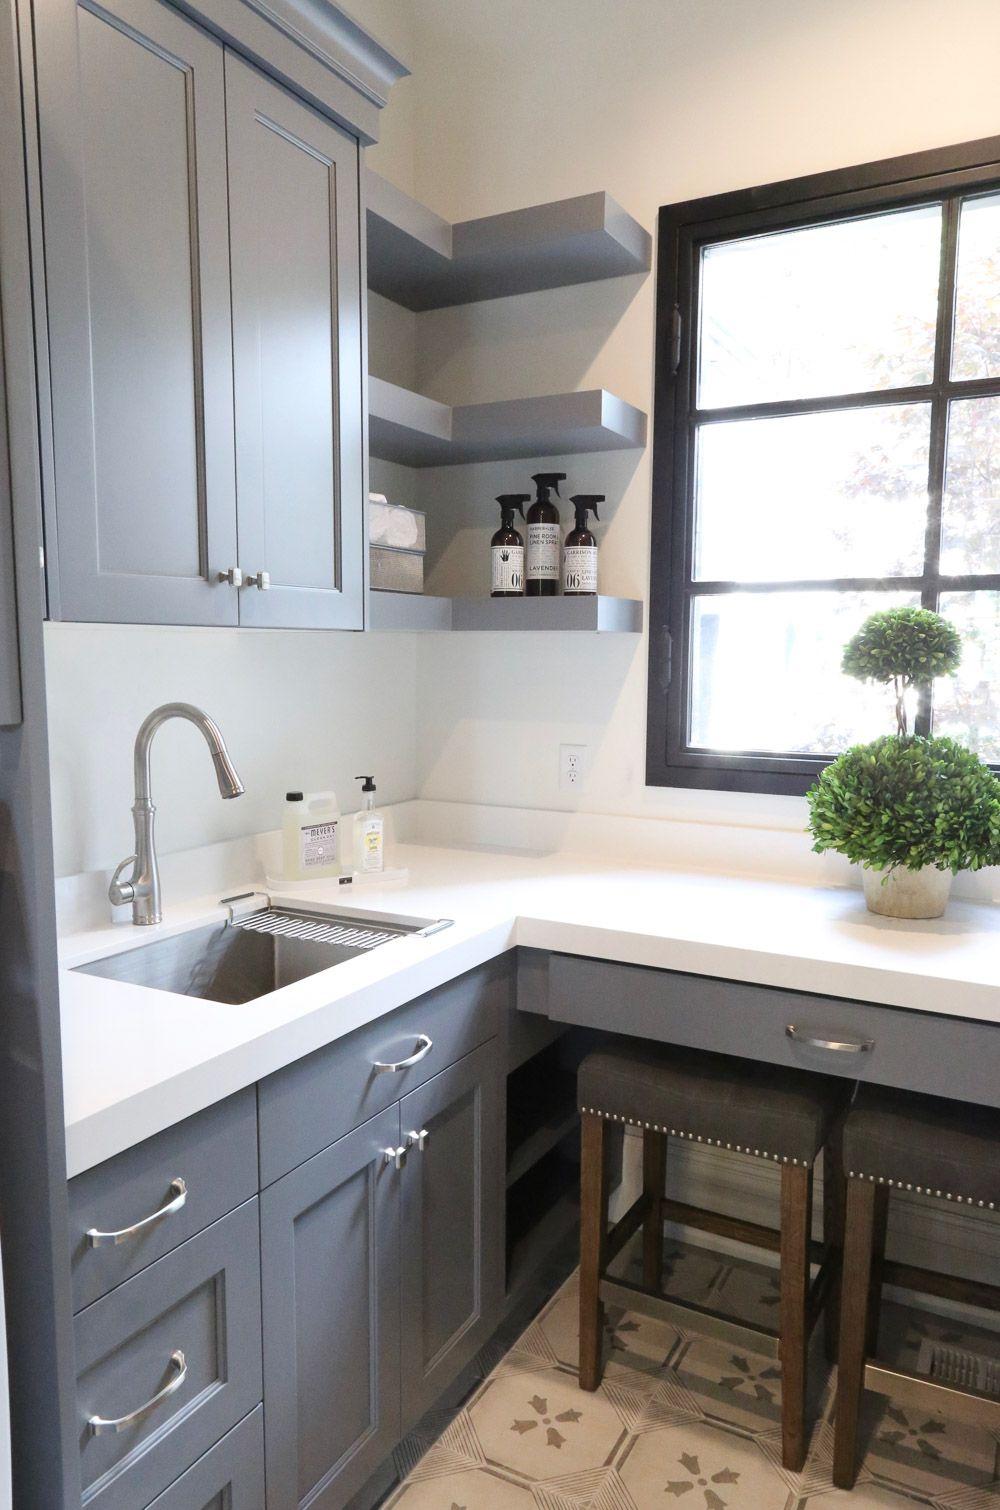 Benjamin Moore Trout Gray: Color Spotlight | Kitchen ...